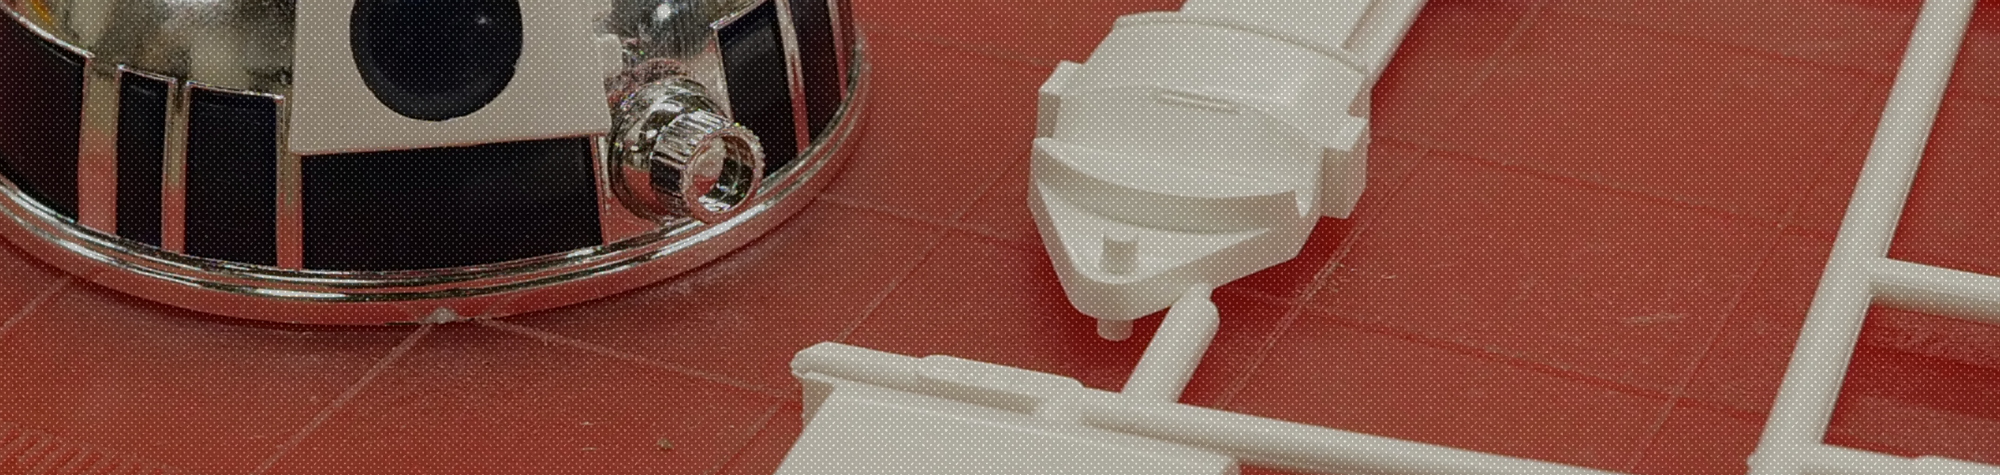 Making Custom Silicone Mats